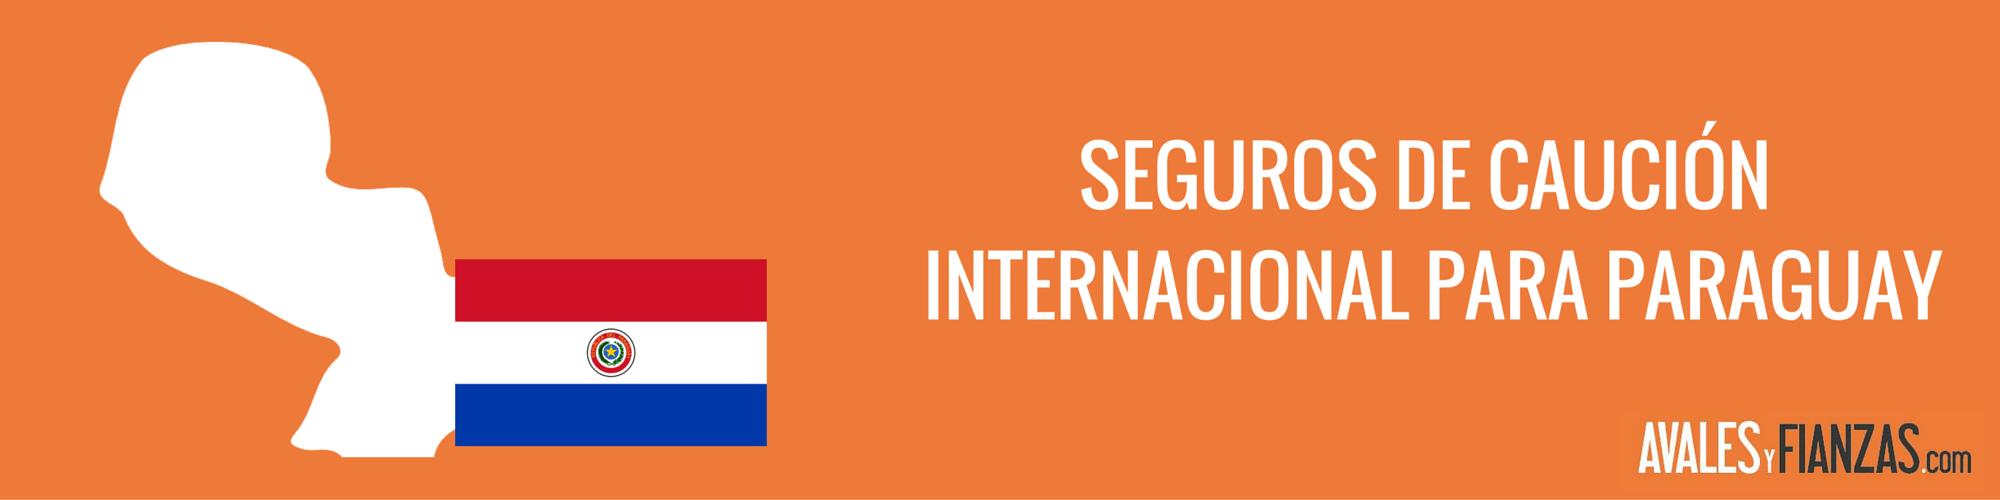 Aval para Paraguay